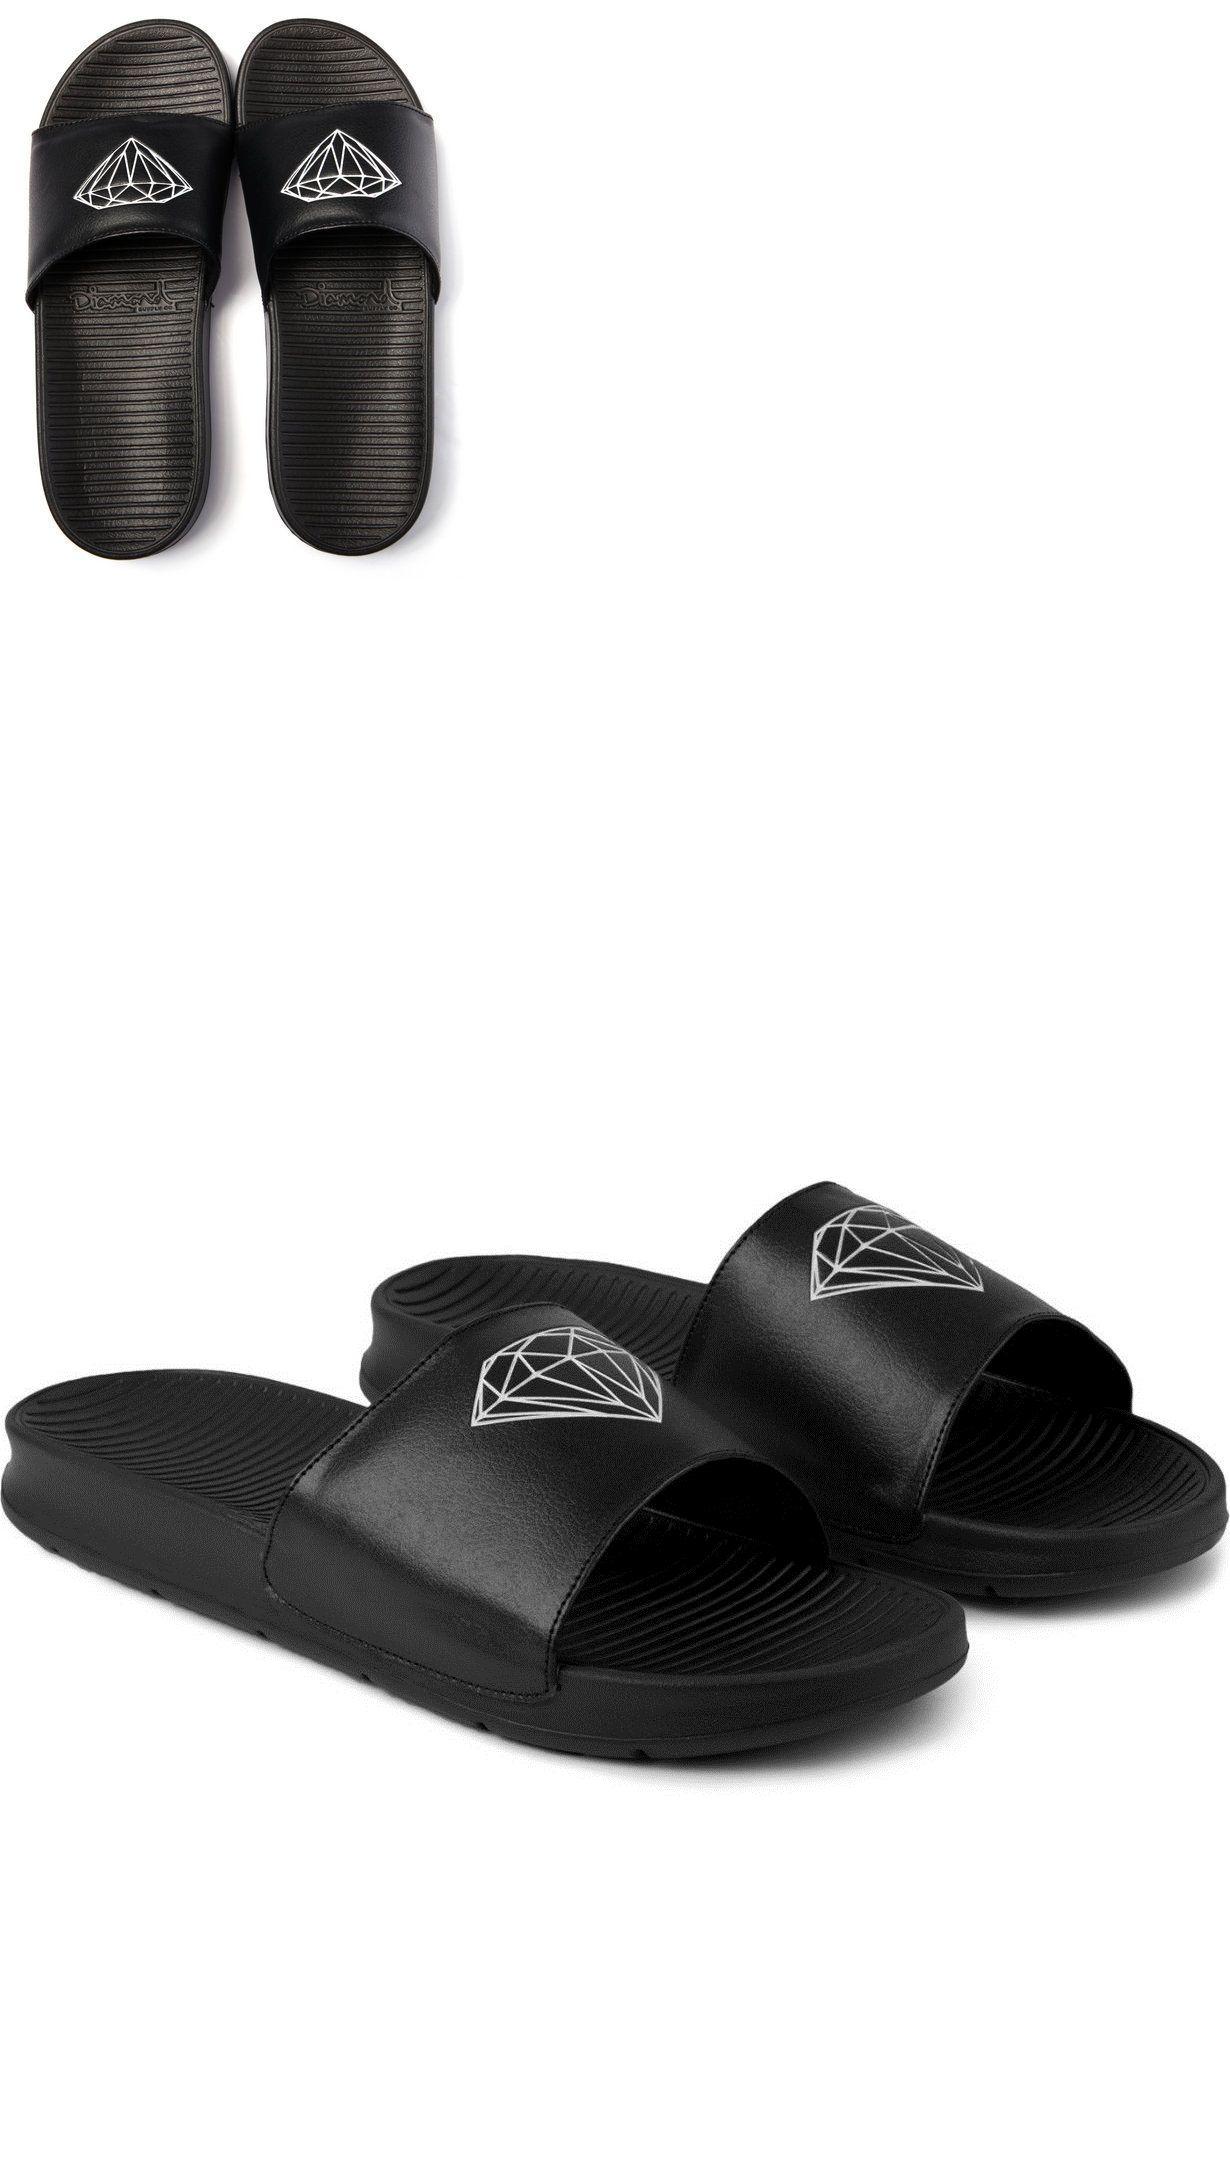 2a425d93b Sandals and Flip Flops 11504: Men S Guys Diamond Supply Fairfax Slides  Sandals Flip Flops Brand New $50 Black -> BUY IT NOW ONLY: $36.99 on eBay!